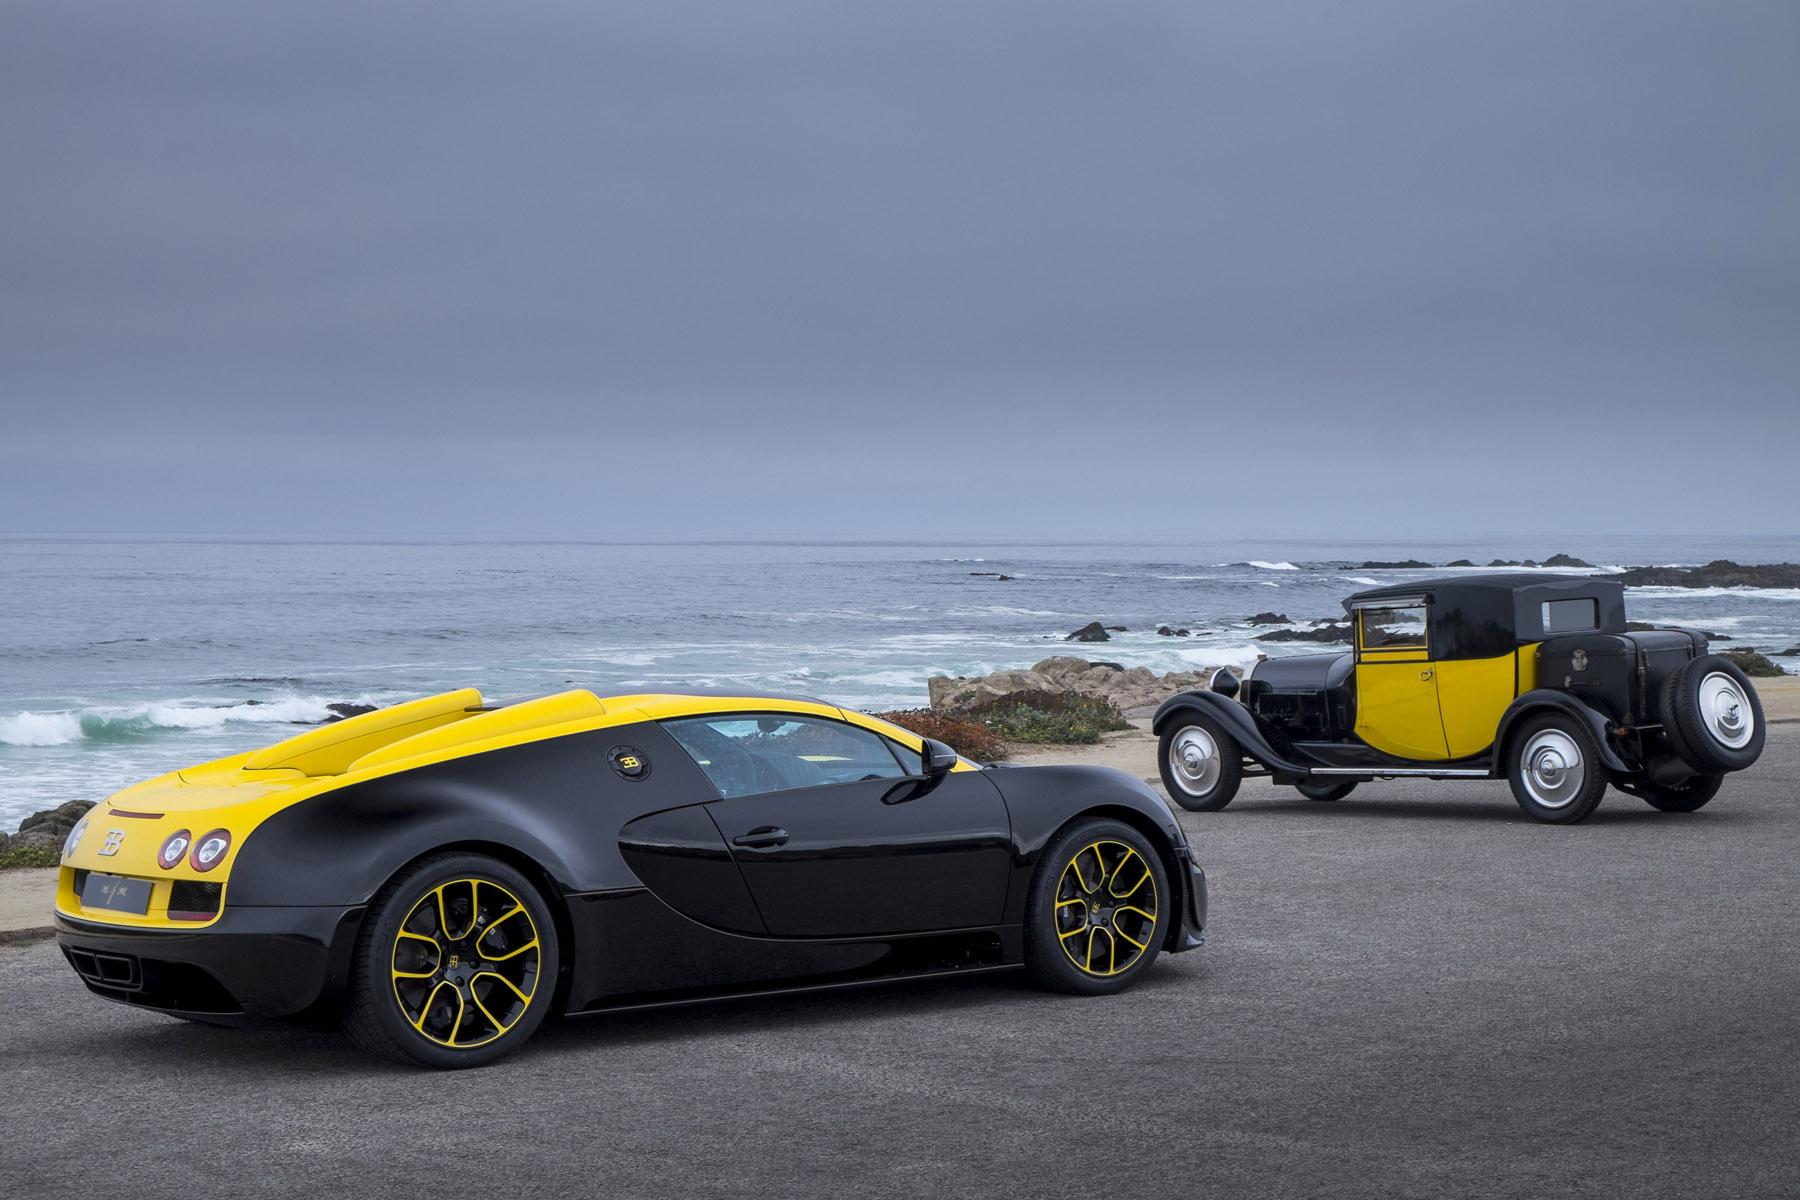 2014 Bugatti Veyron Grand Sport Vitesse 1of1